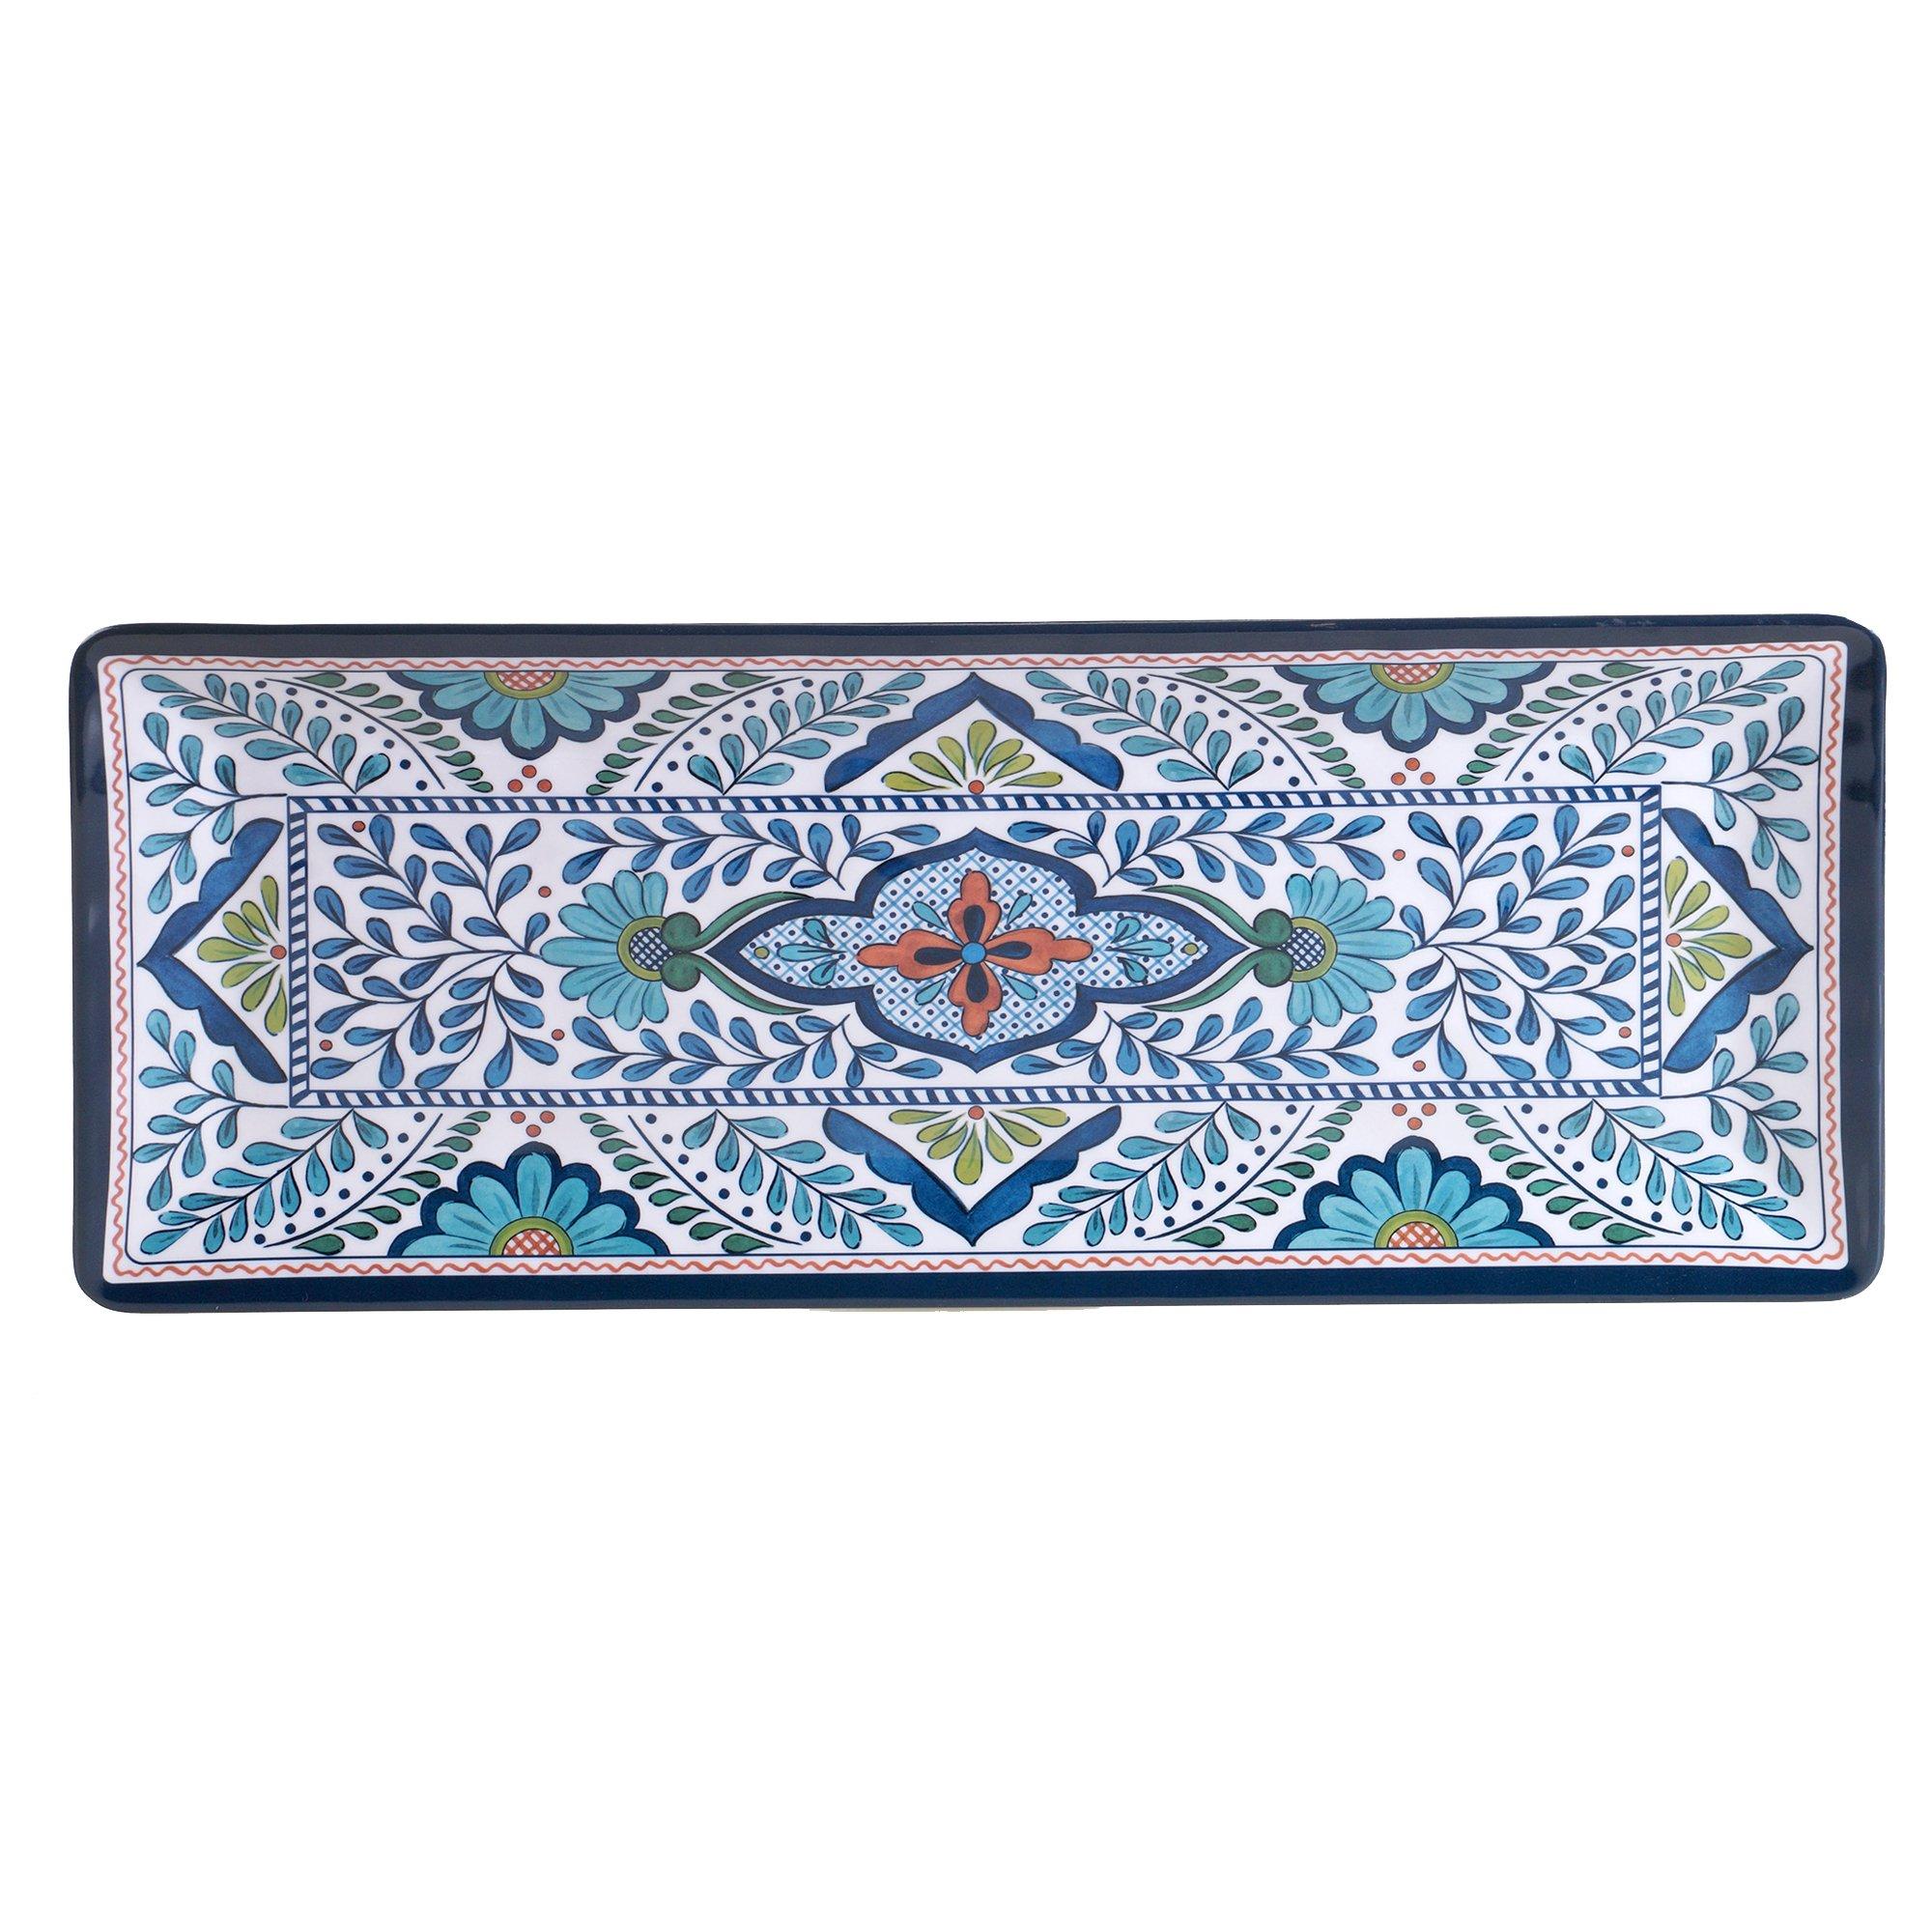 Certified International Talavera Melamine 19'' x 8'' Rectangular Platter, Multicolor